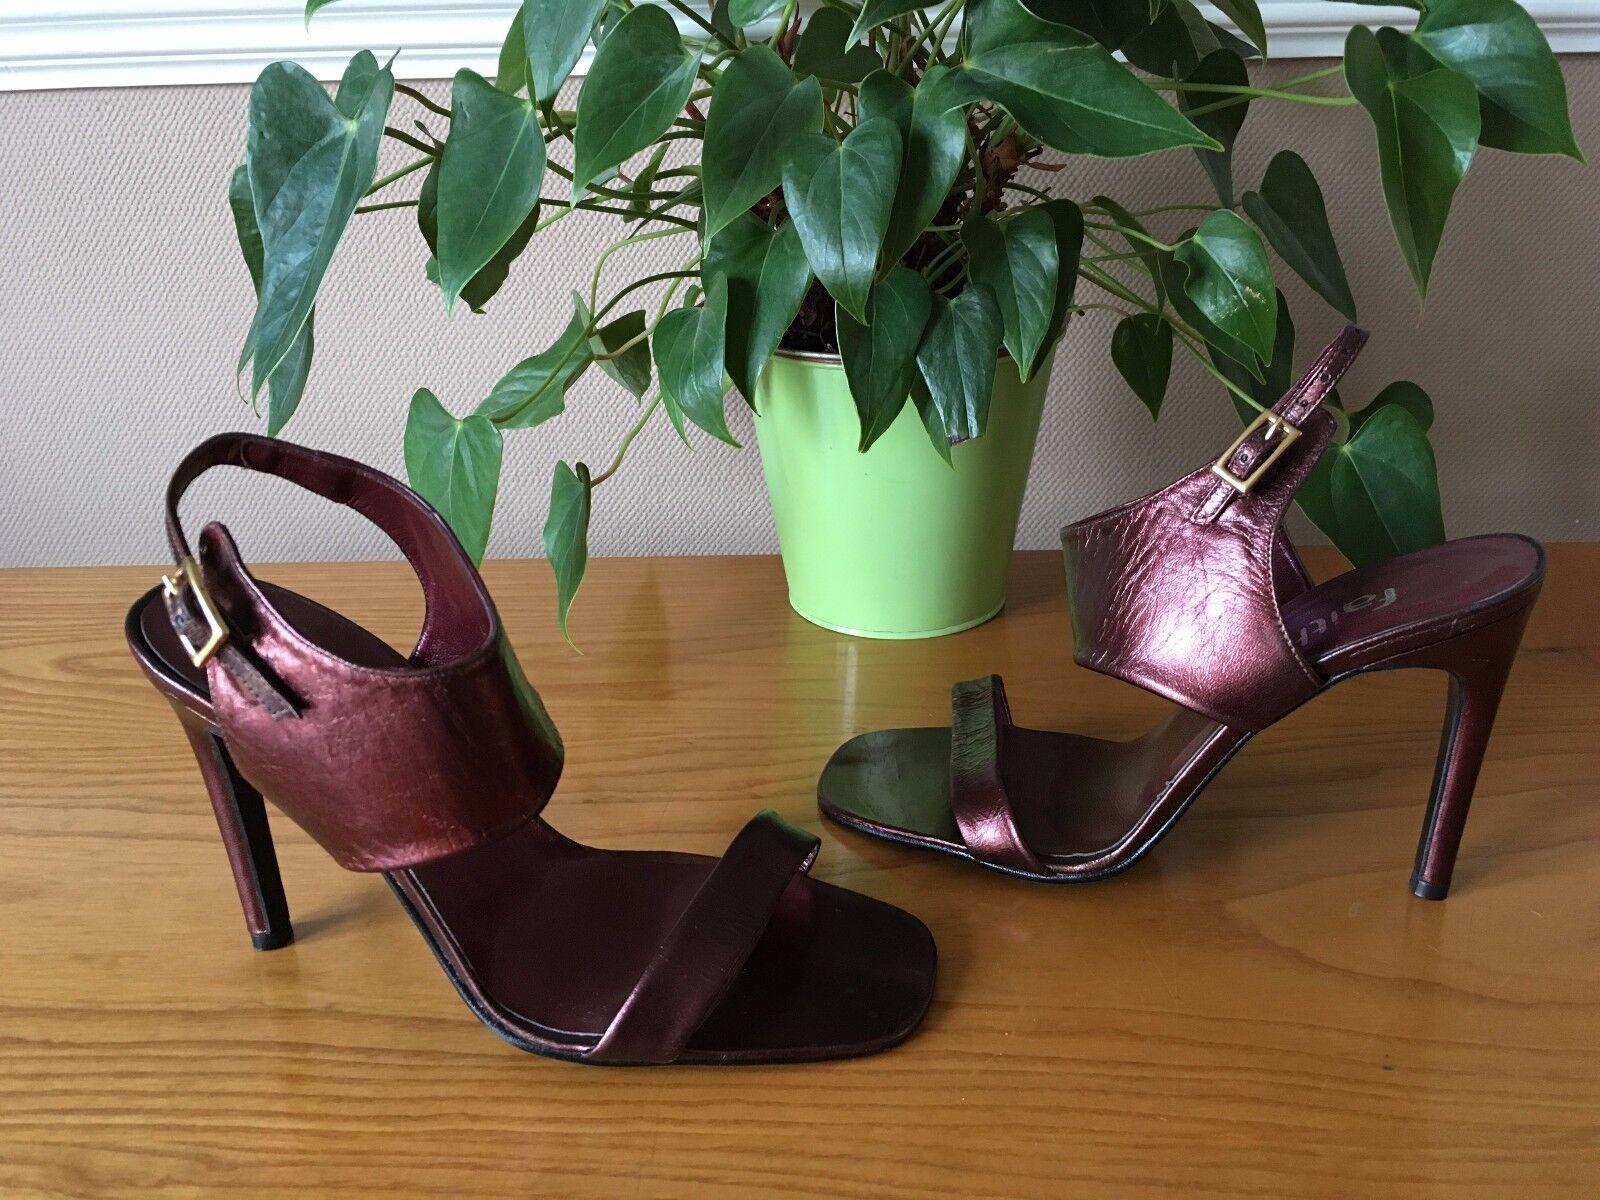 Ladies Faith mettalic rose gold leather strappy stiletto shoes UK 4 EU 37 NEW